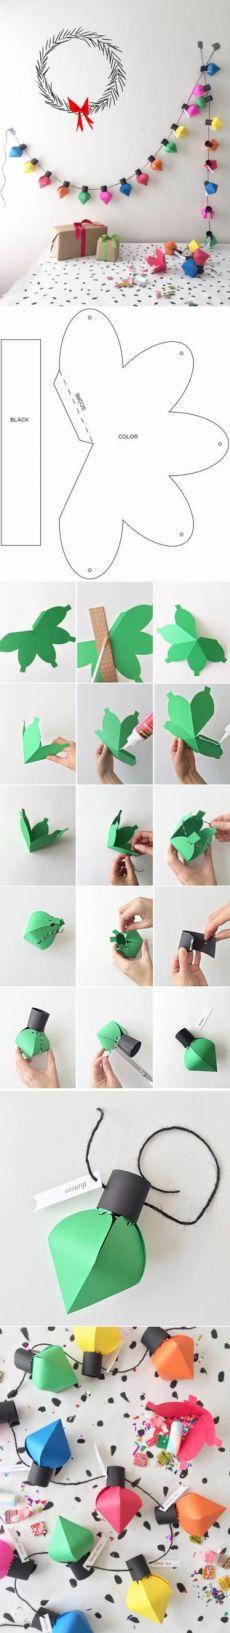 I love creative ❤ Christmas Paper Crafts, Christmas Projects, Holiday Crafts, Holiday Fun, Christmas Crafts, Christmas Decorations, Diy And Crafts, Crafts For Kids, Lightbulbs